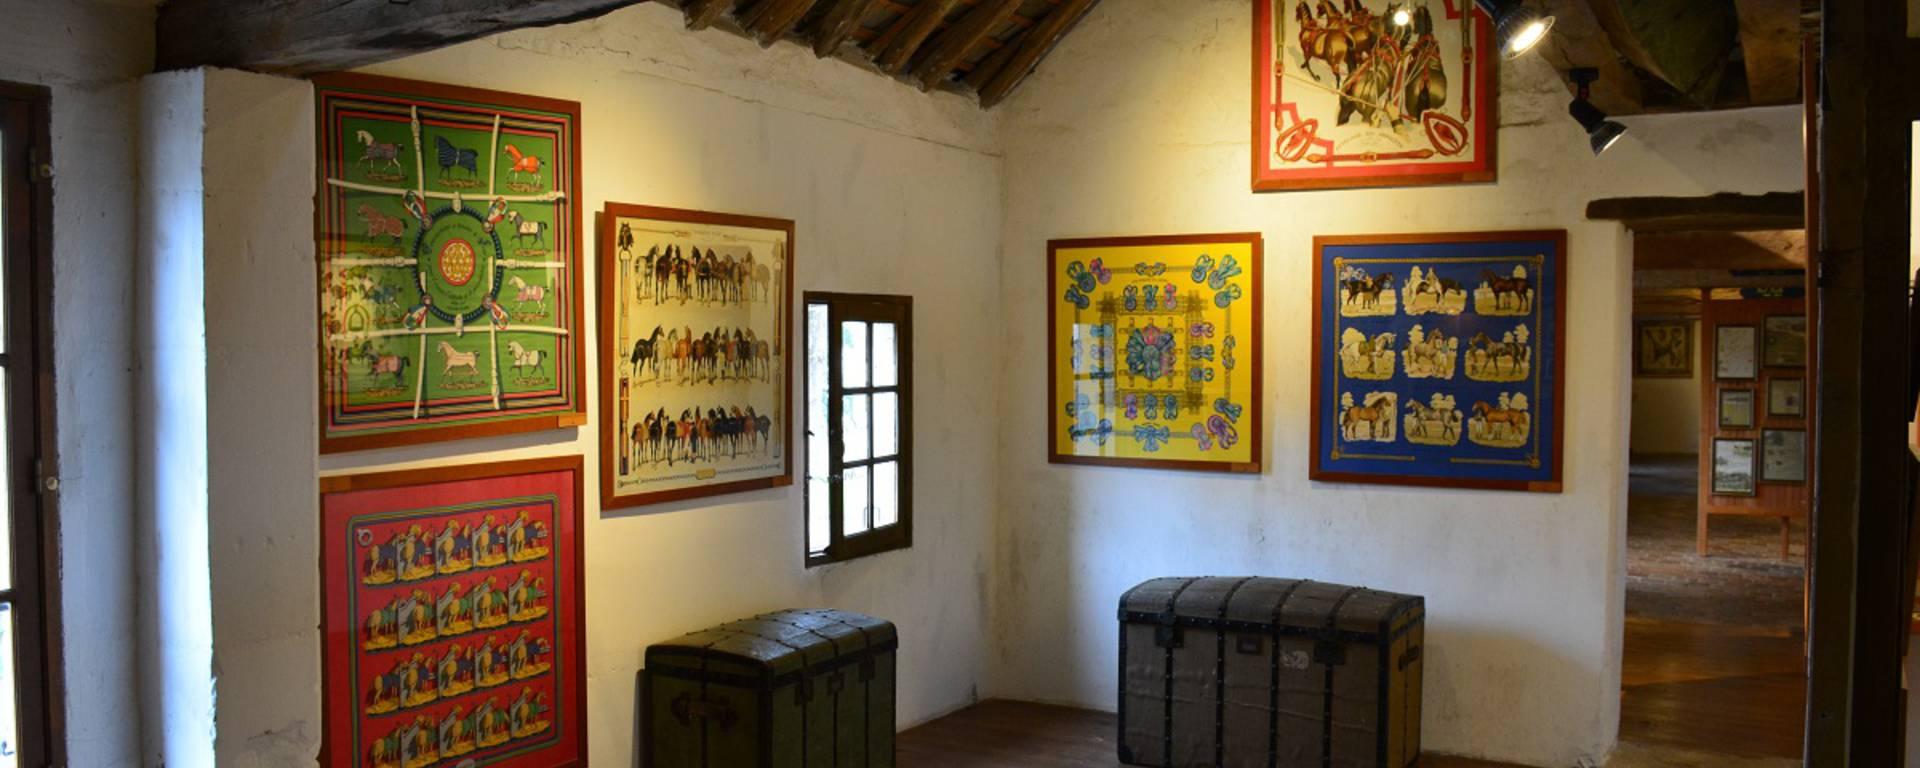 La sala Hermès del castello di Montpoupon © OTBC